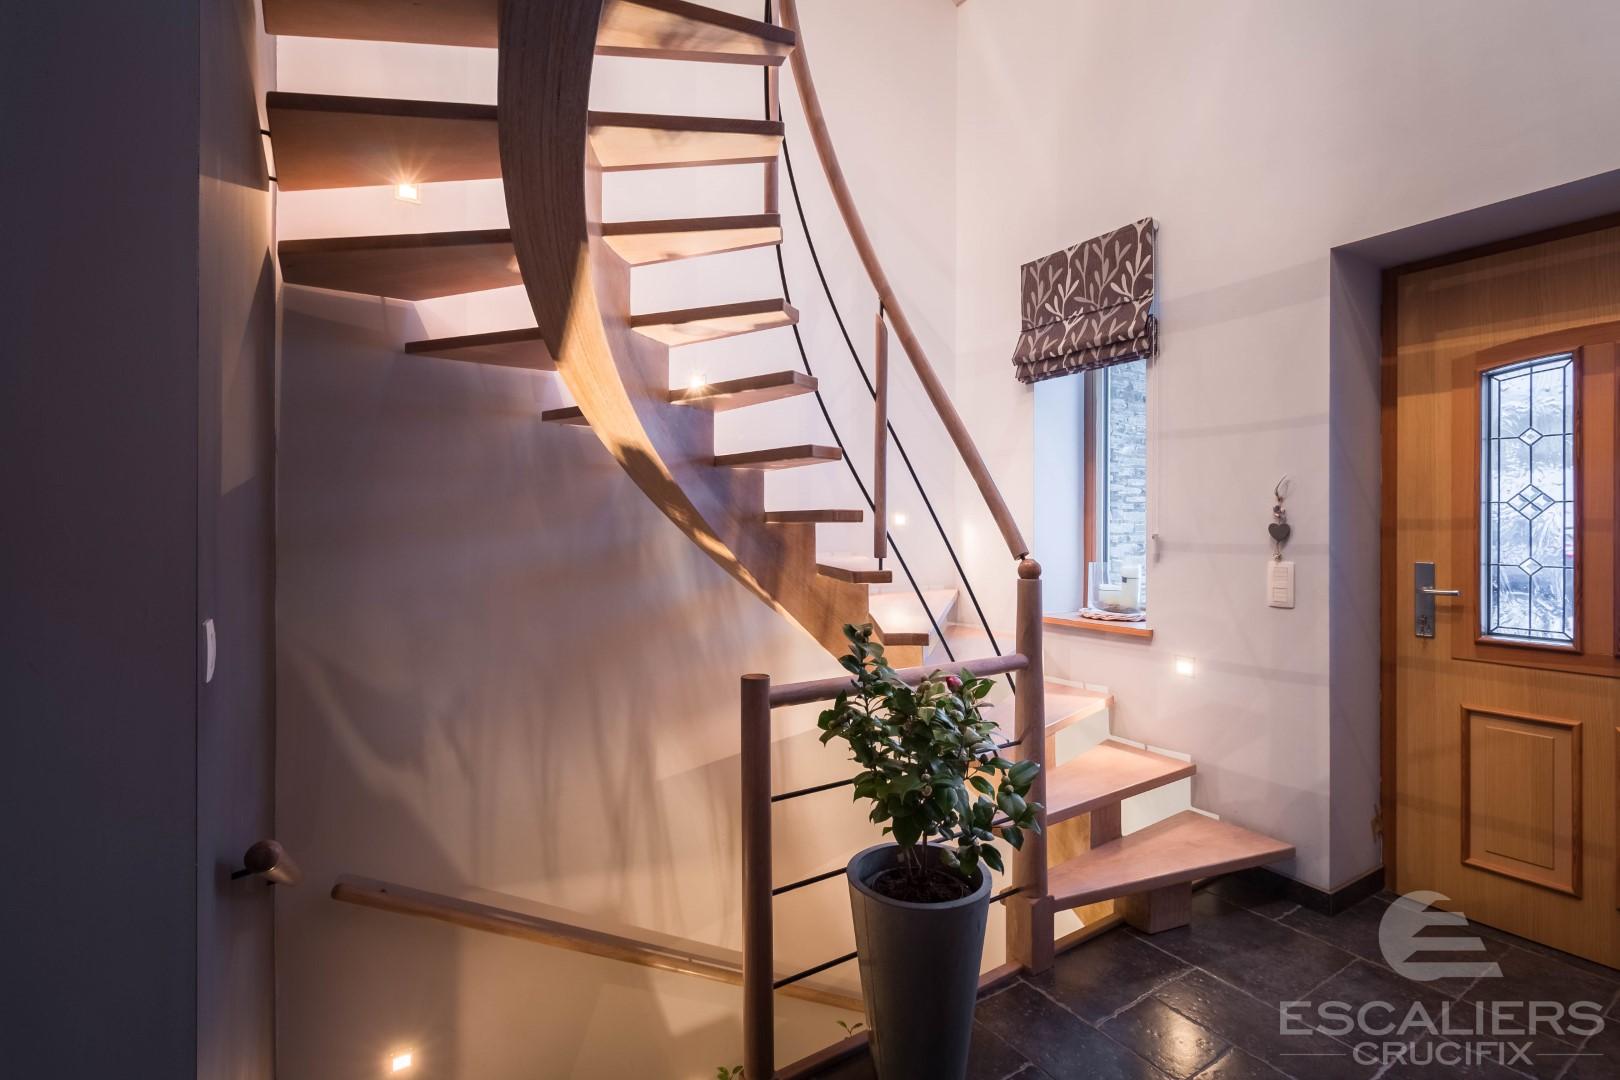 Escalier Crucifix artisanal